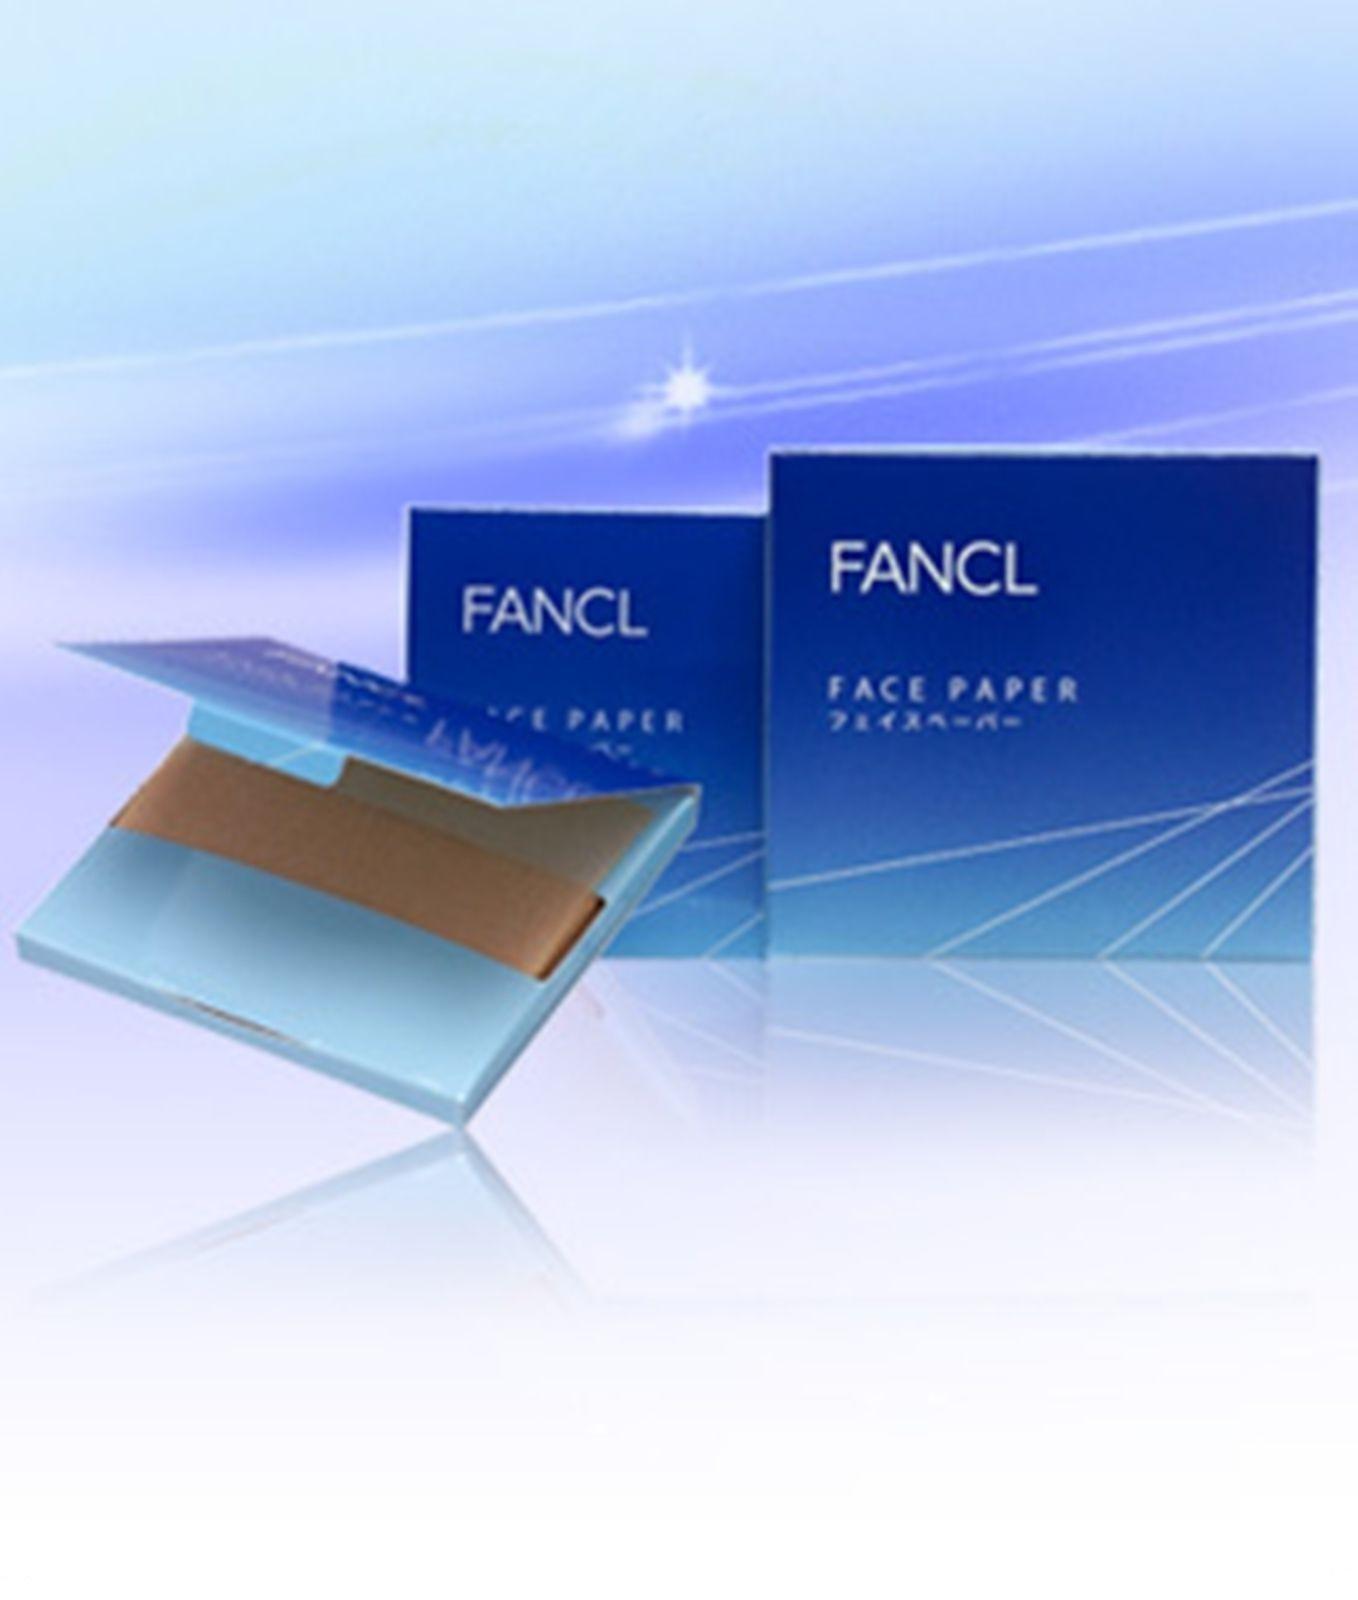 Fancl Extra High Sebum Absorption Face Oil Blotting Paper 100pcs X 3 Japan Made